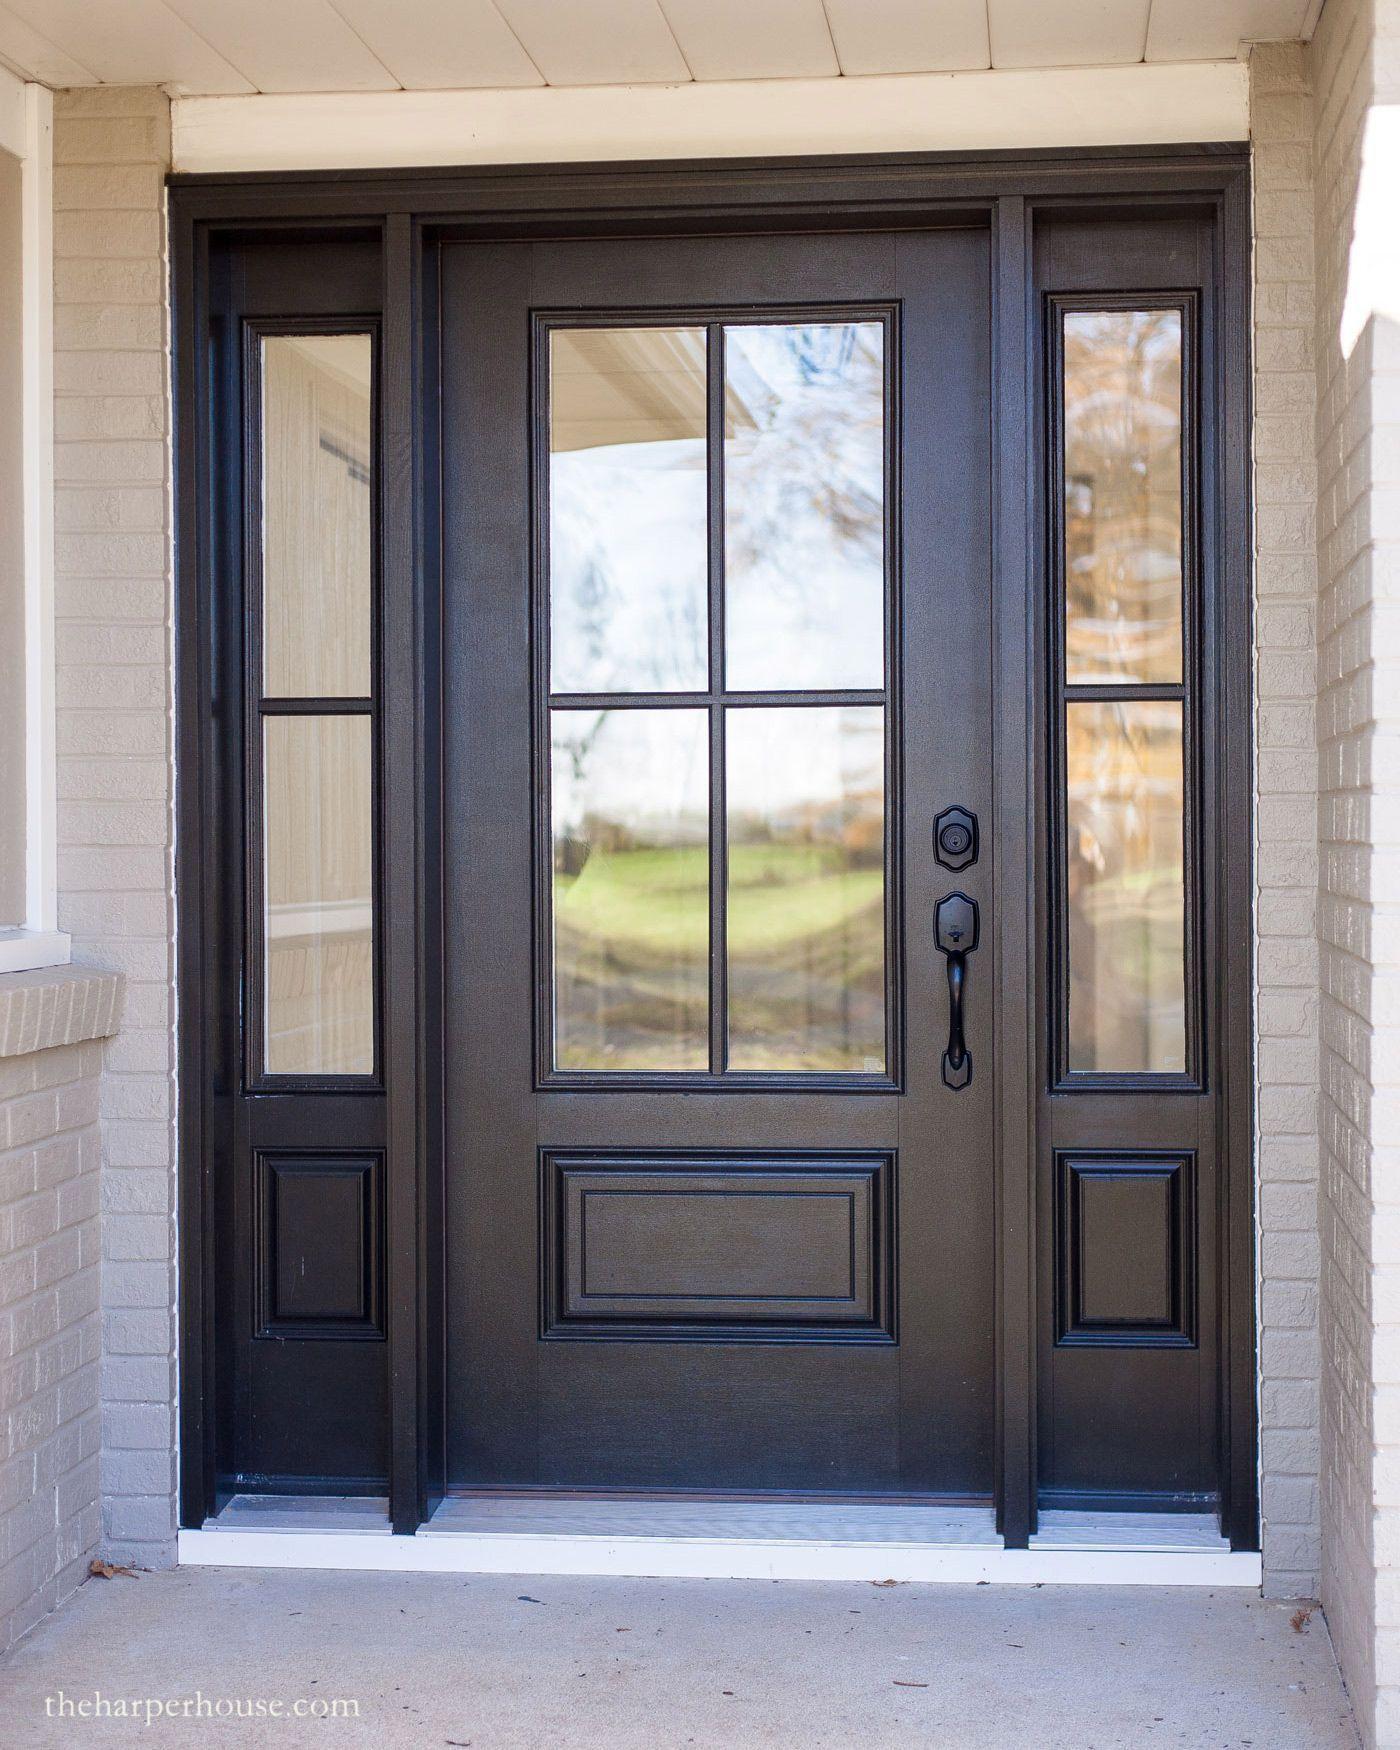 50 Contemporary Modern Interior Door Designs For Most: 5 Stylish Contemporary Interior Doors Ideas